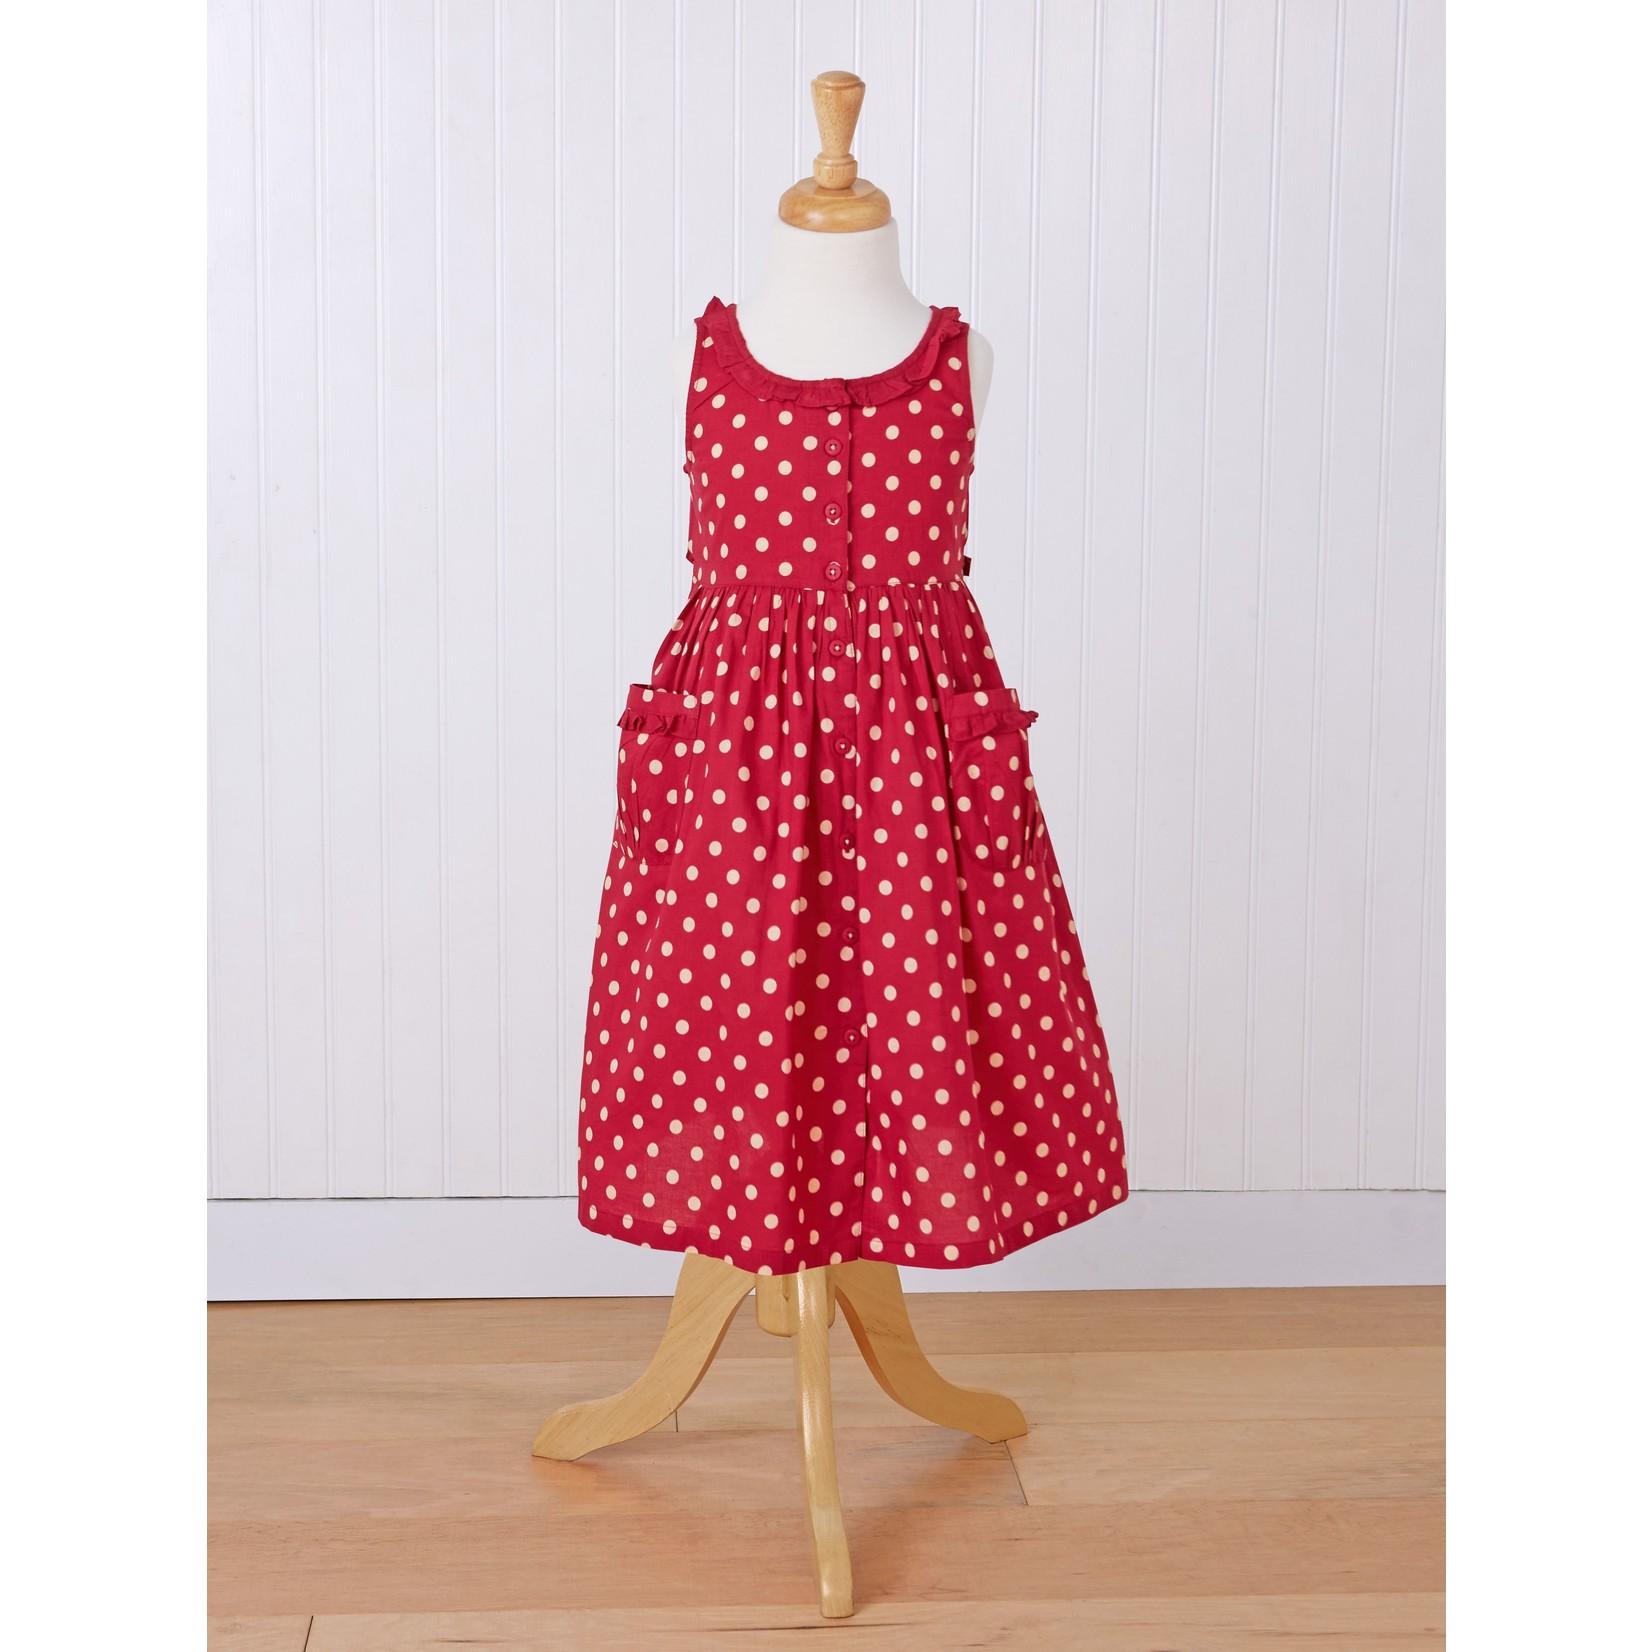 April Cornell Molly Dot Girls Cambric Dress